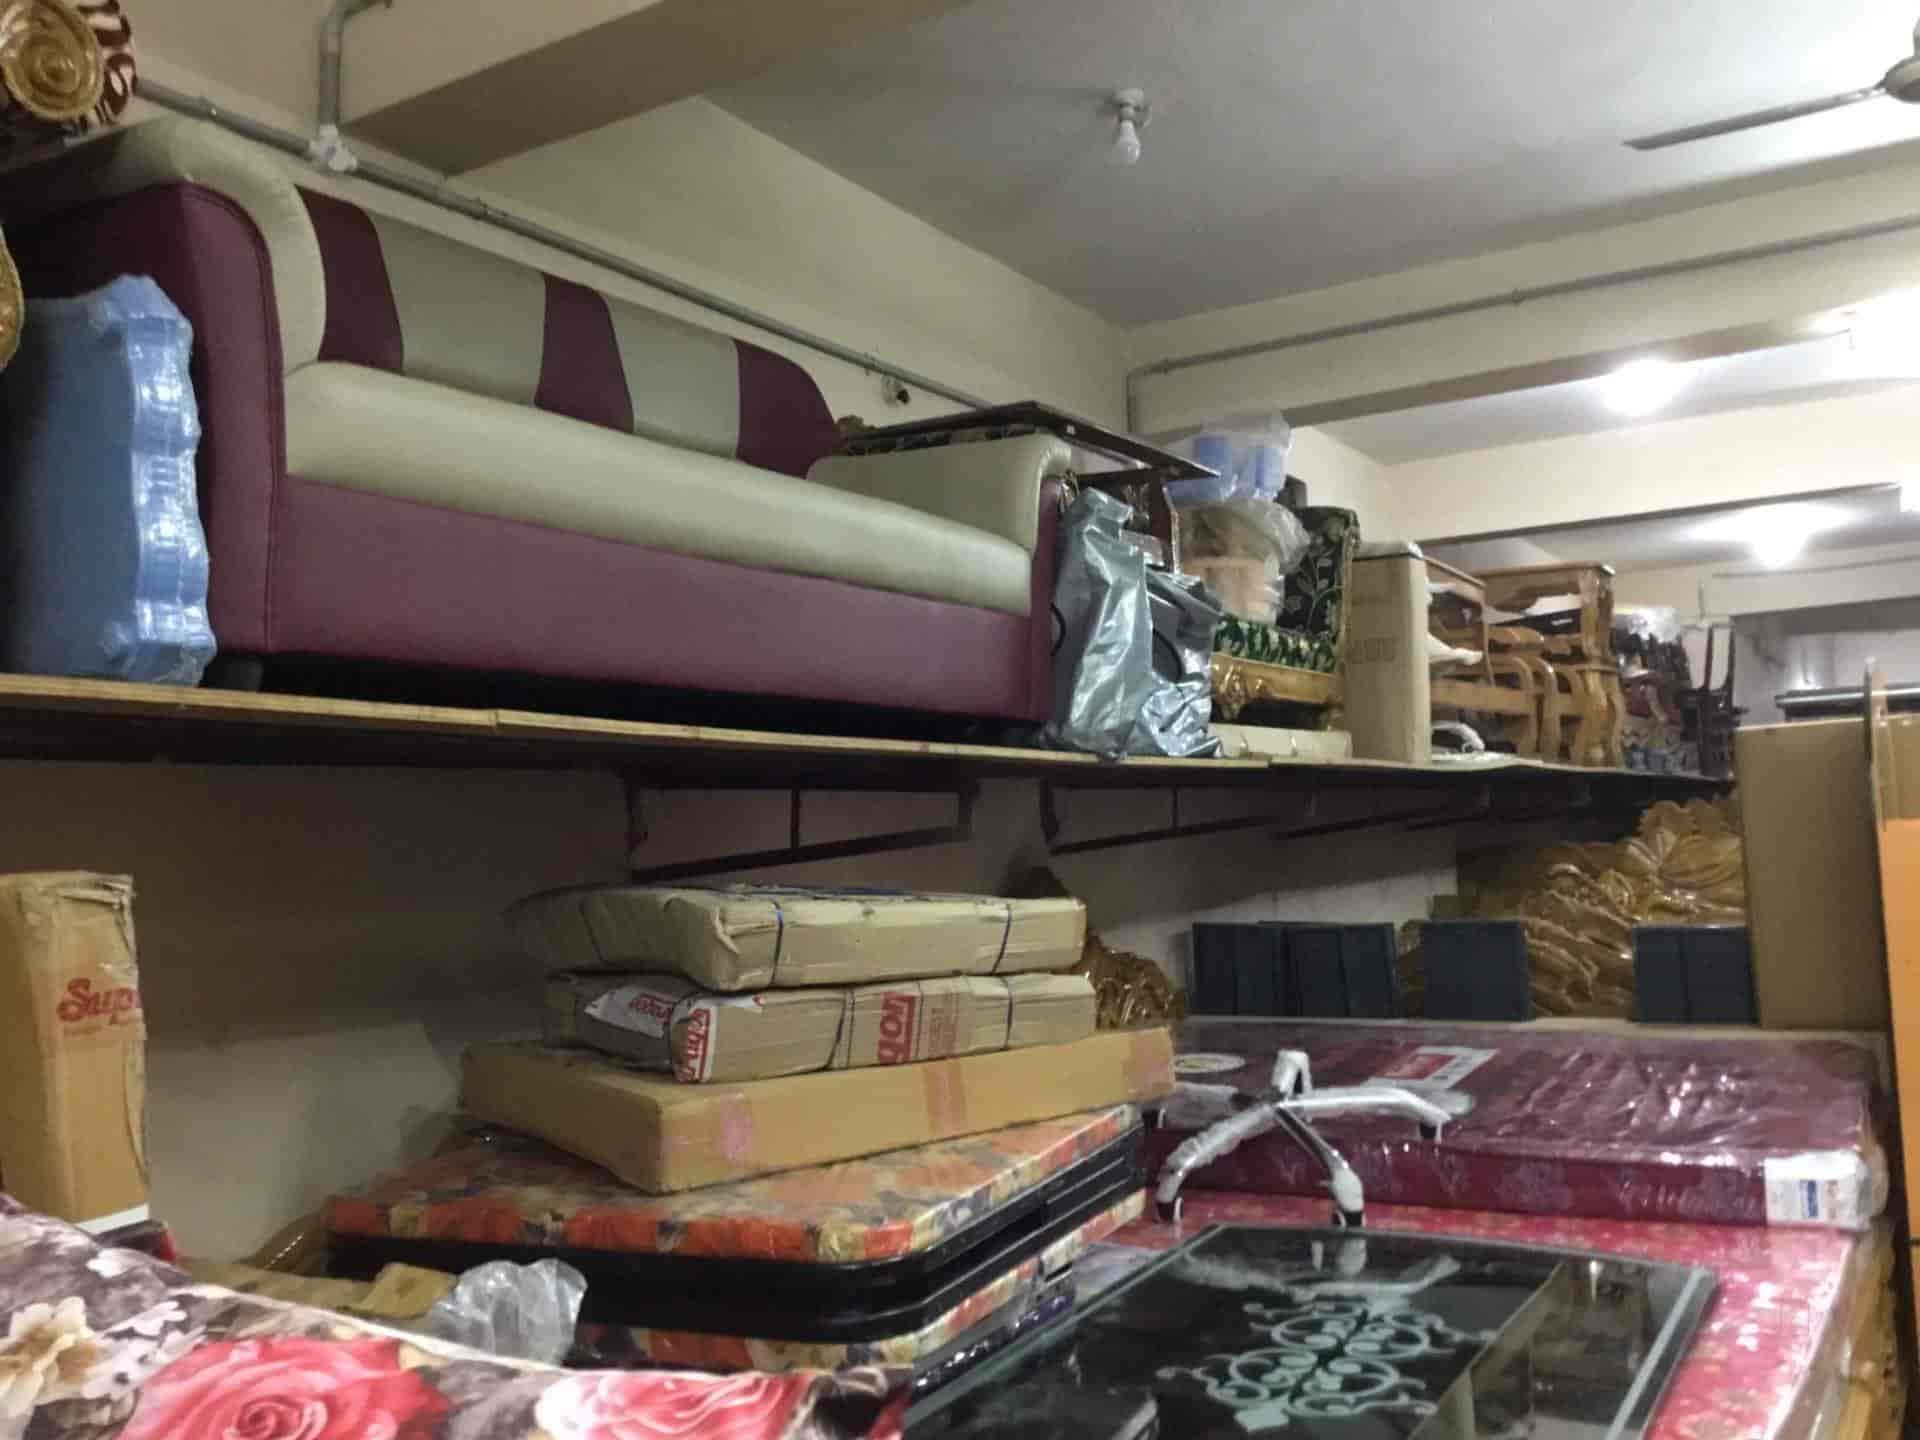 Levitz furniture shopee berhampur ho levitz furniture shoppee furniture dealers in berhampur orrisa justdial